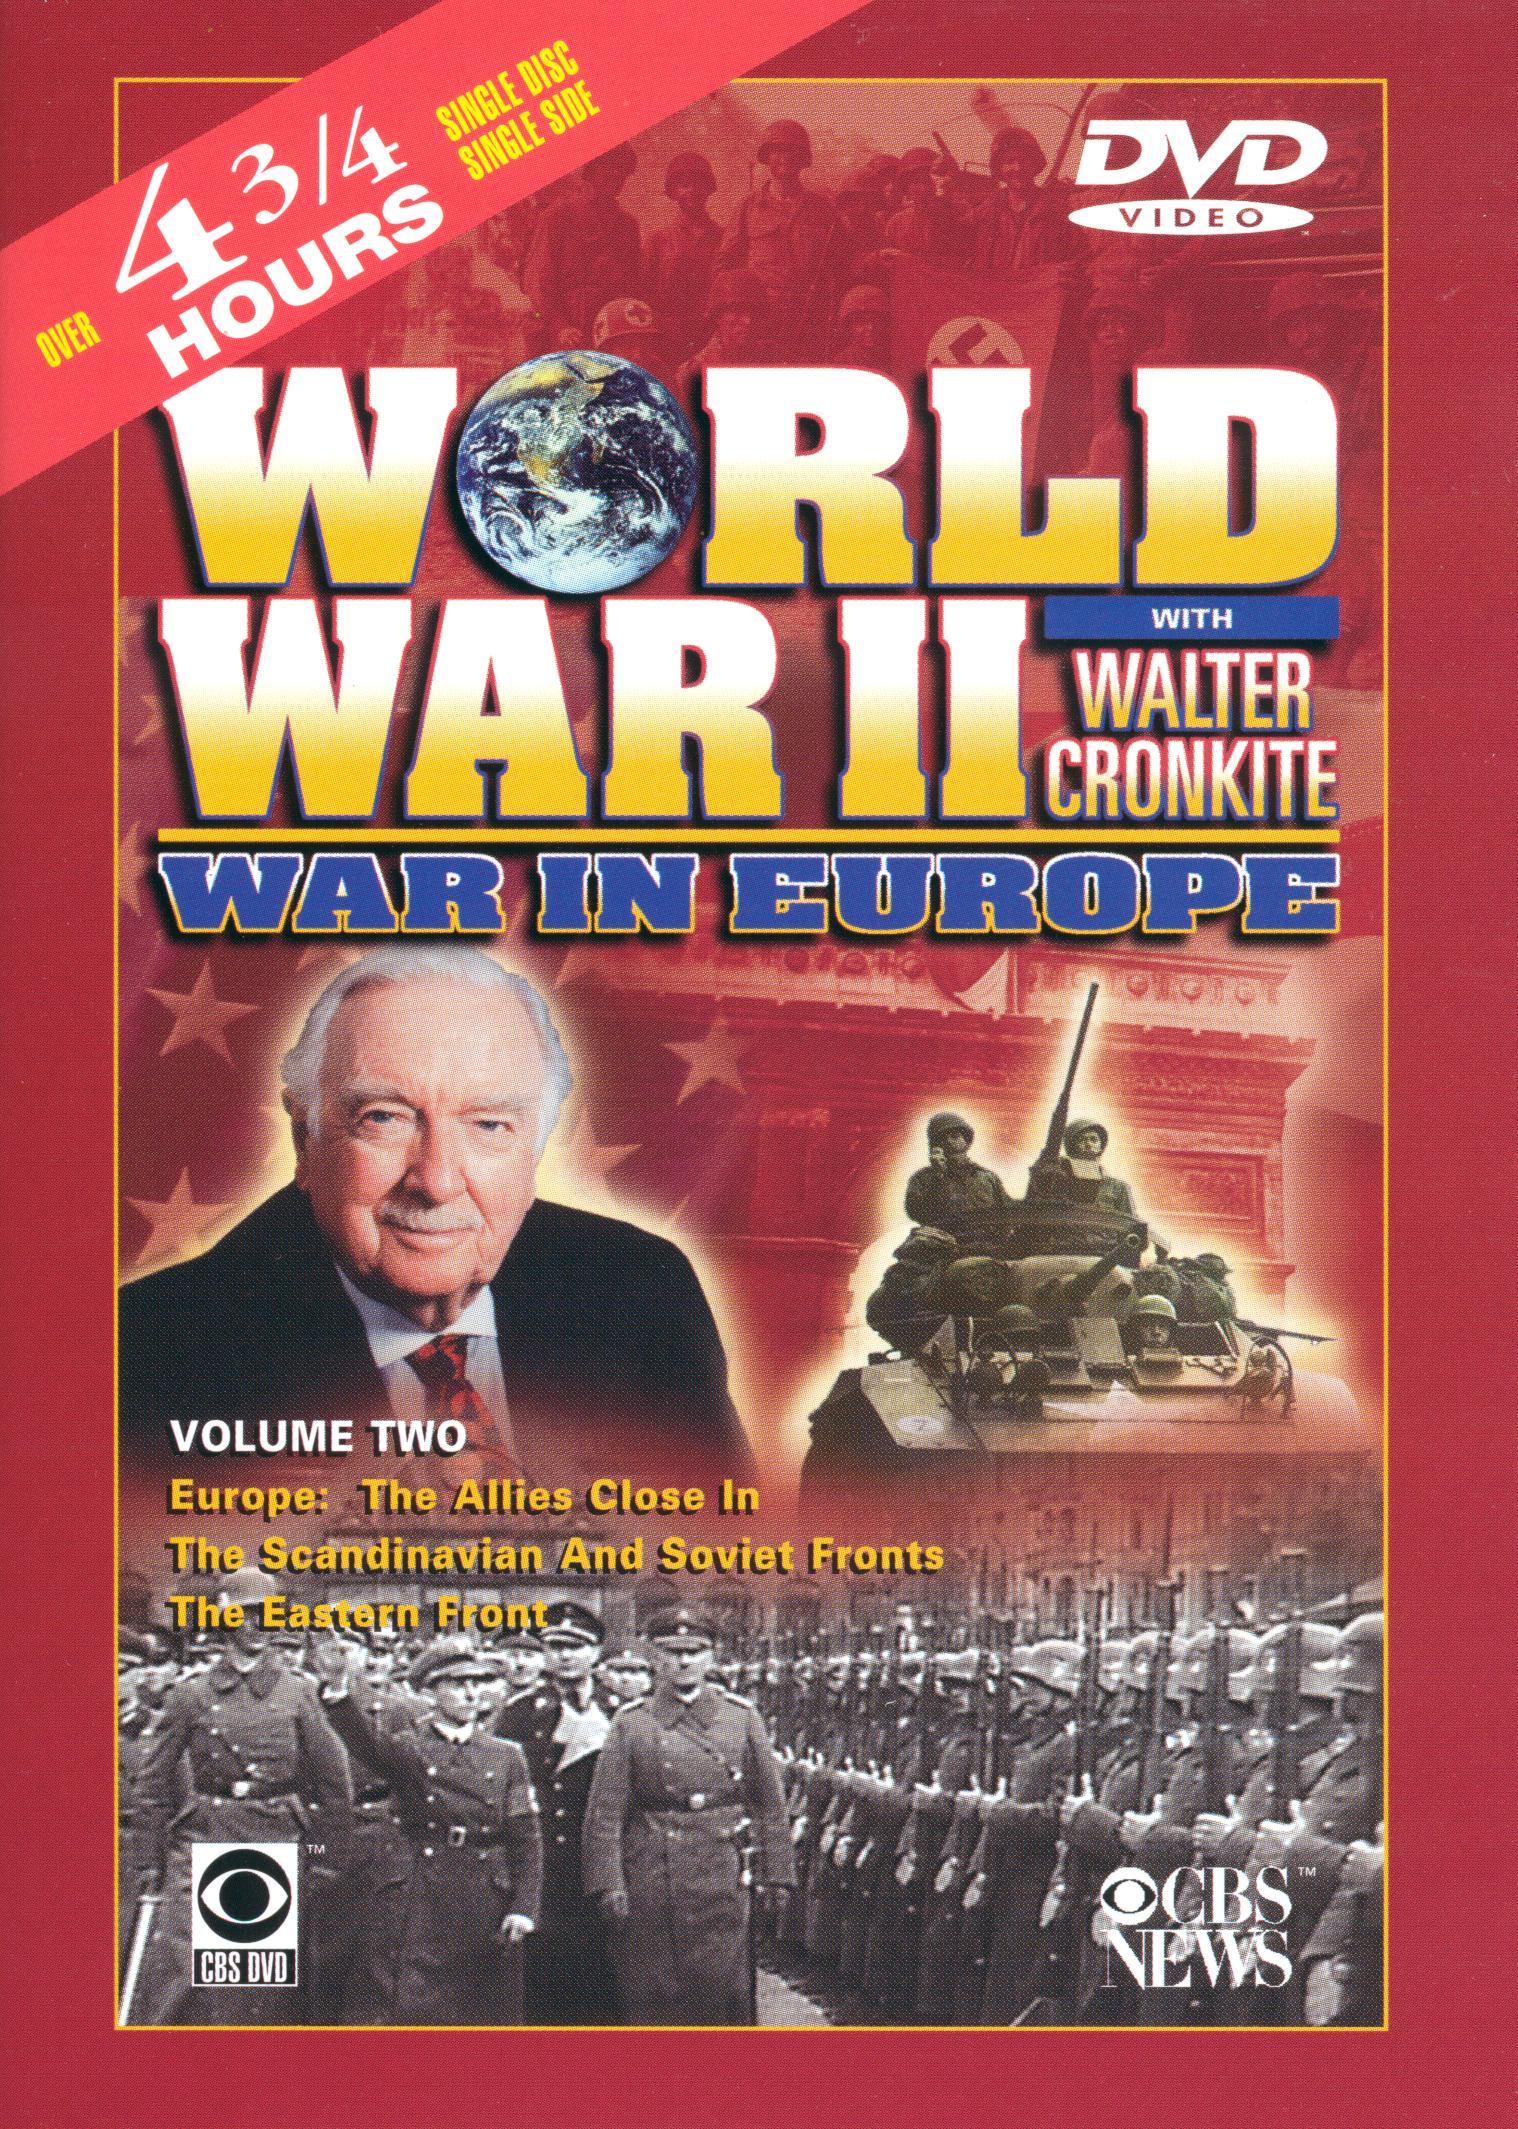 World War II With Walter Cronkite: War in Europe, Vol. 2